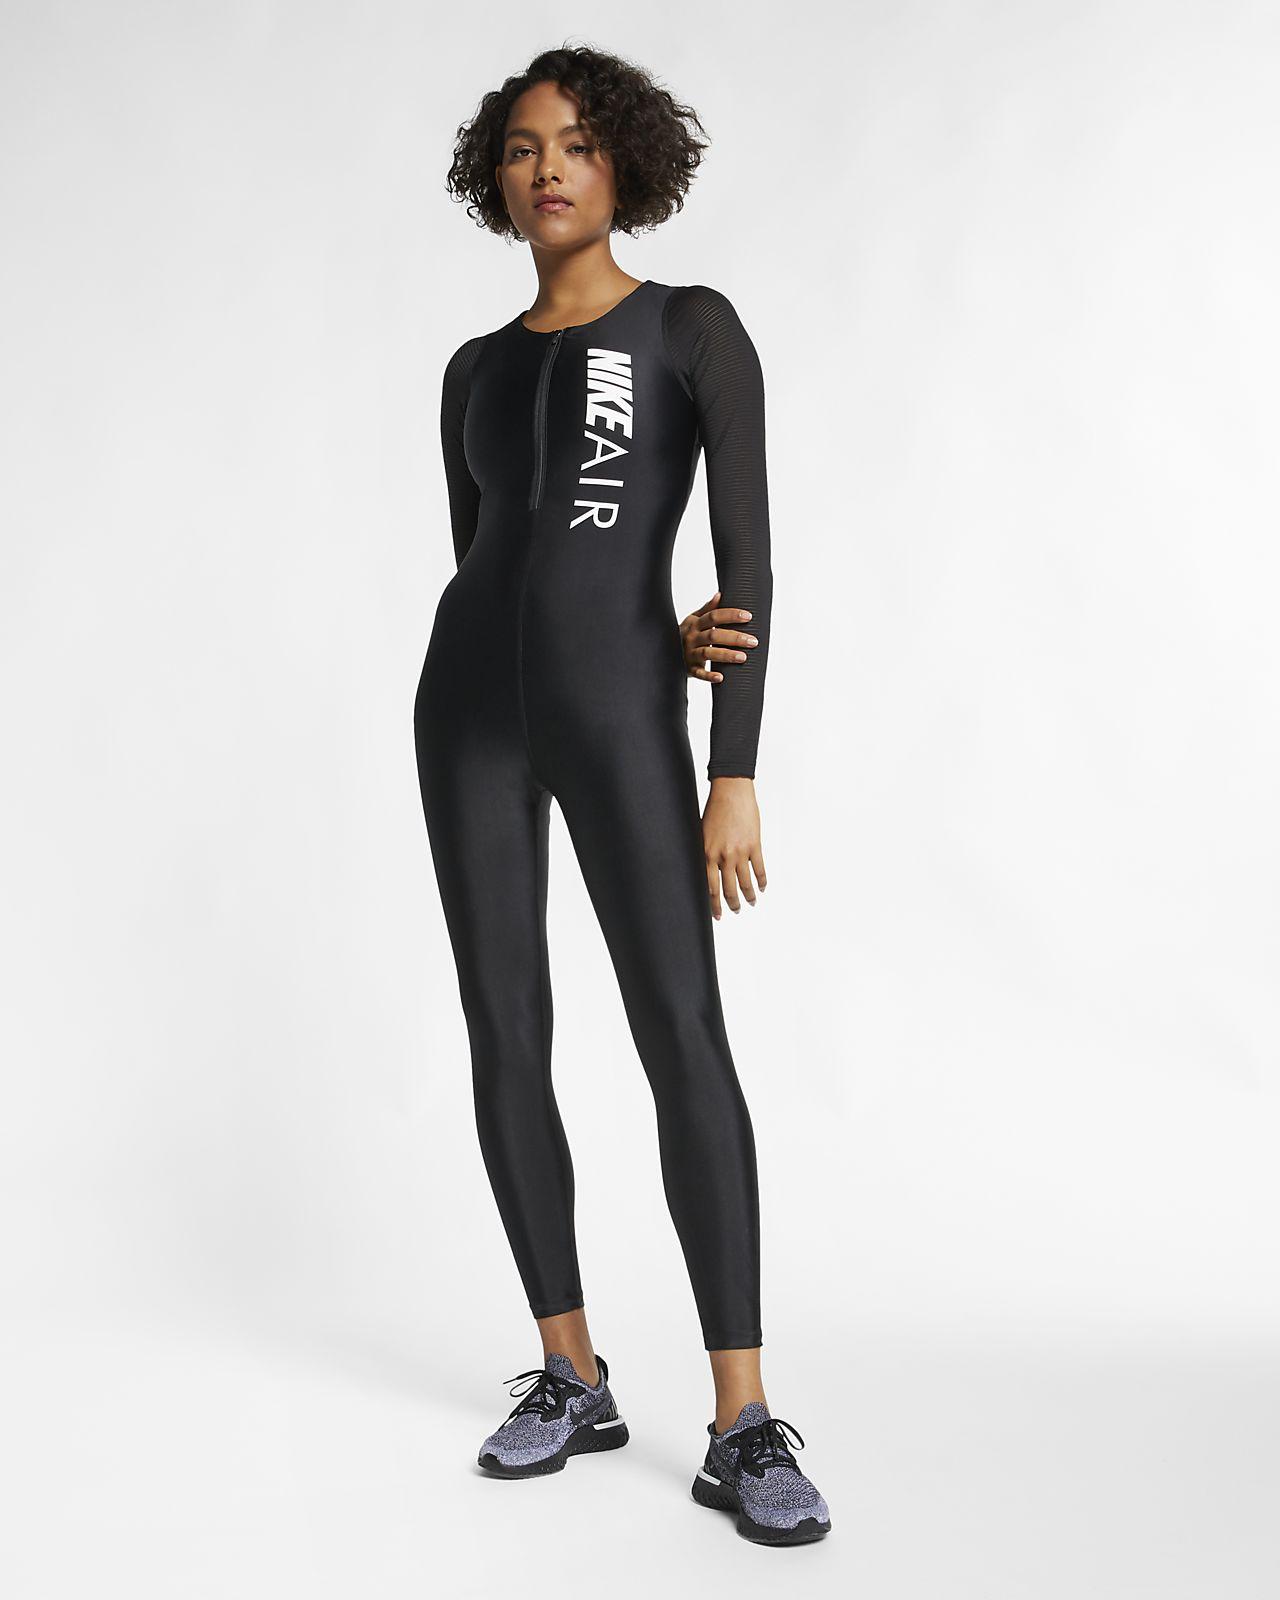 low priced 82681 b0ed8 Nike Air Womens Running Bodysuit. Nike.com AU